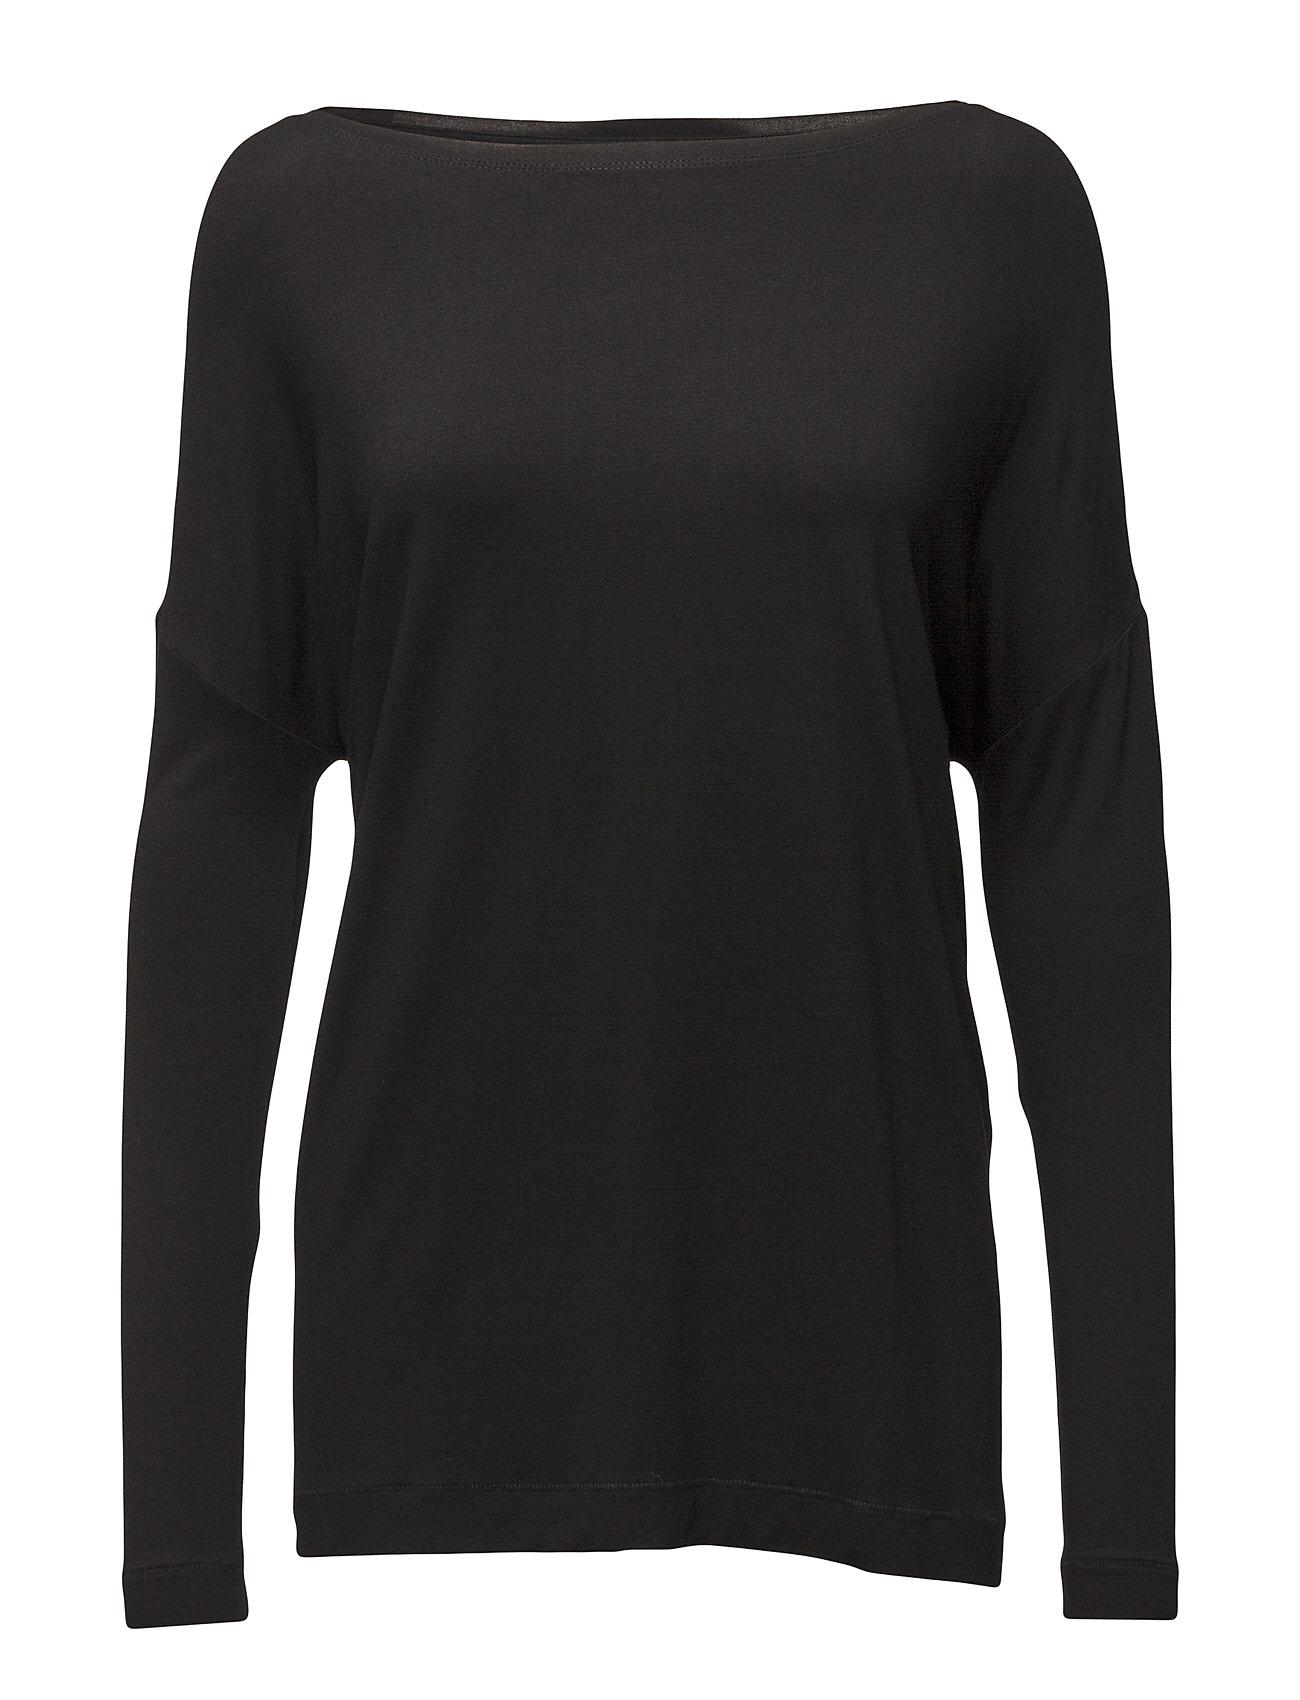 Image of Alloi Langærmet T-shirt Sort By Malene Birger (2421321741)